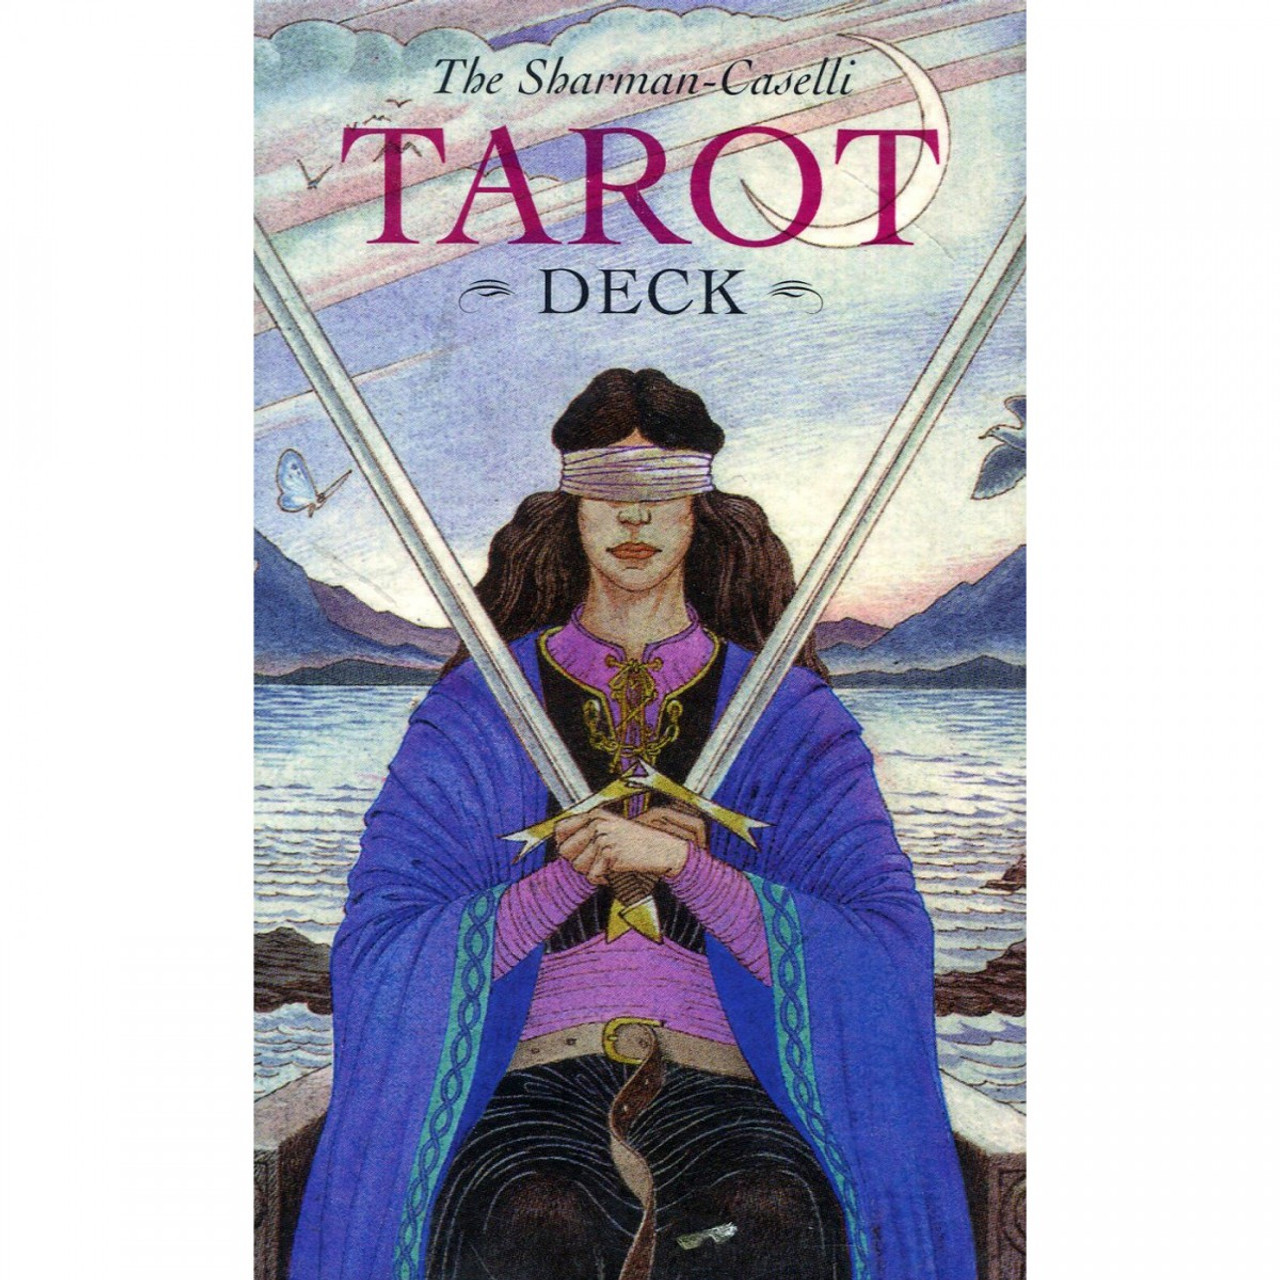 The Sharman-Caselli Tarot Cards by Juliet Sharman-Burke